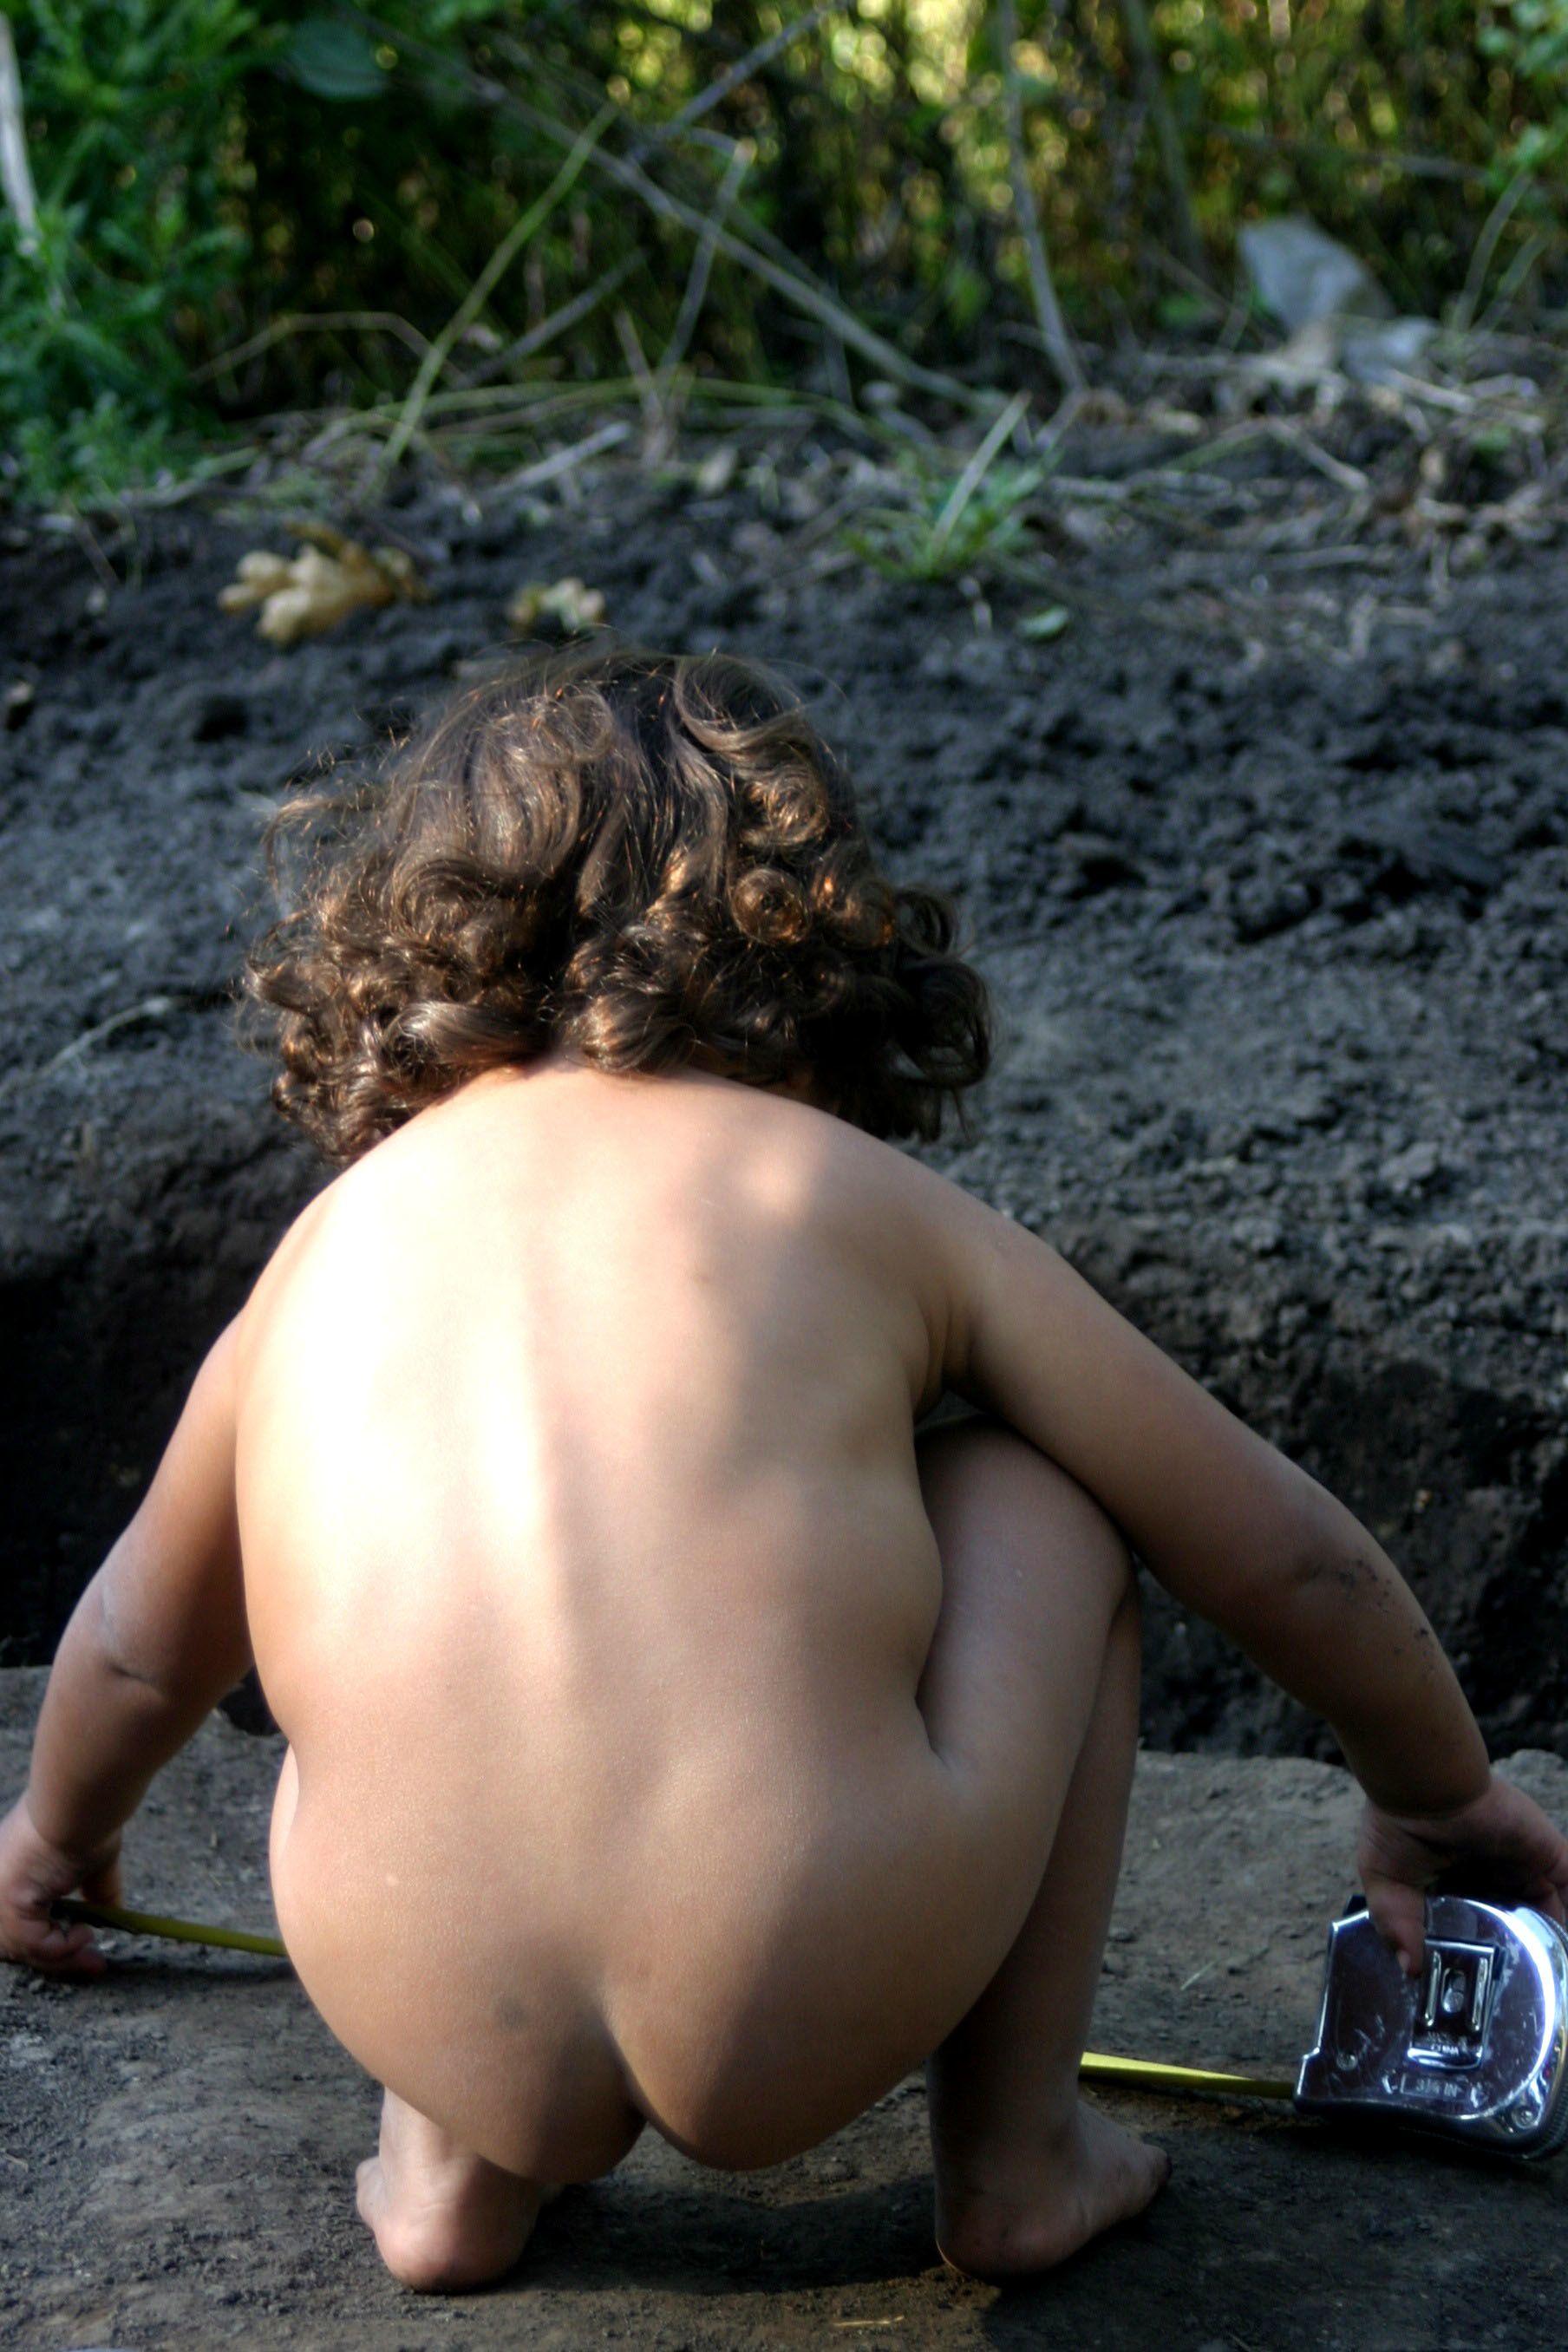 Azov Nudist Boys Images Femalecelebrity | adanih.com